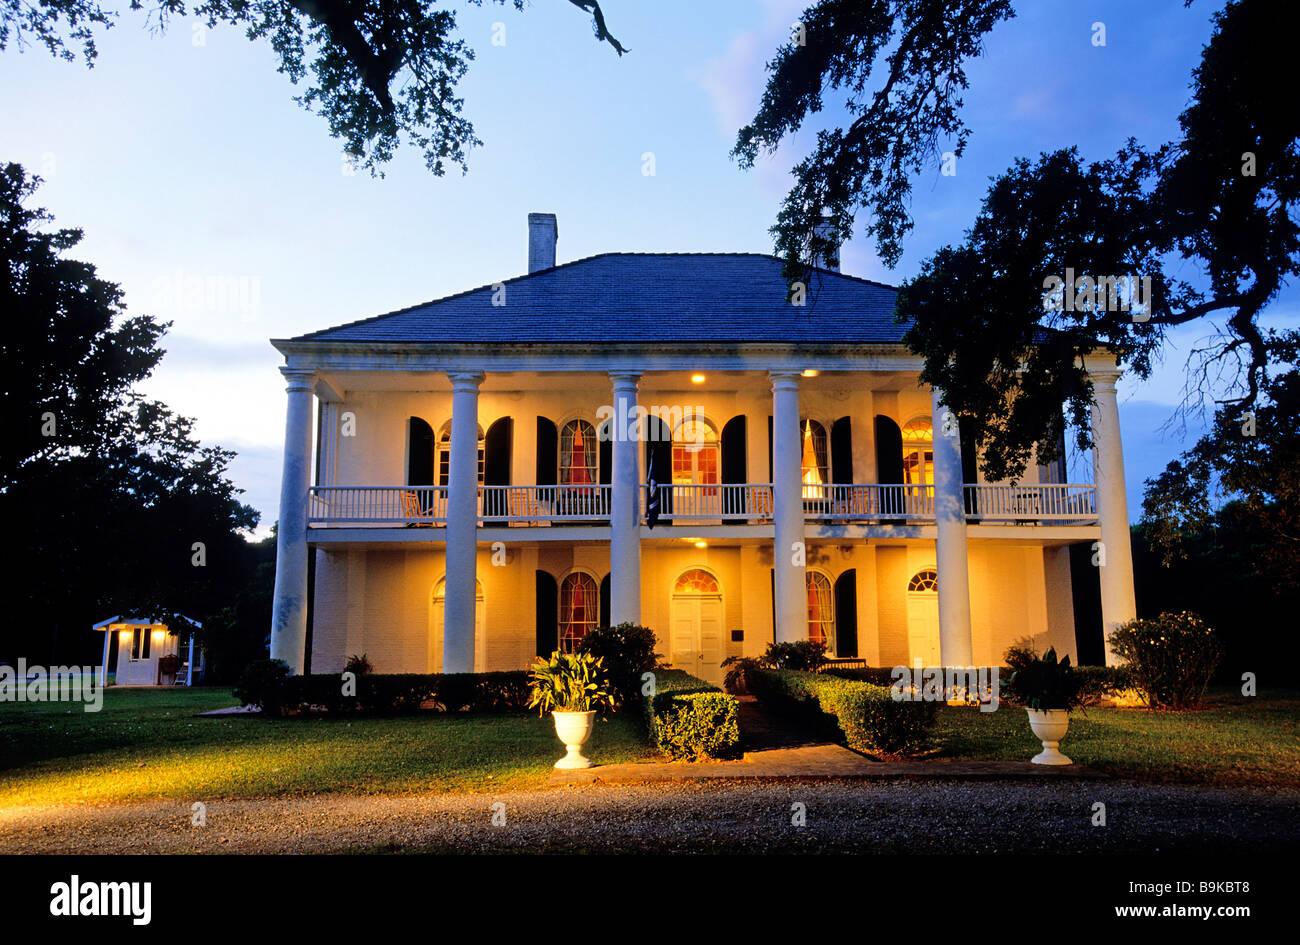 United States Louisiana Lafayette Chretien Point Plantation 1831